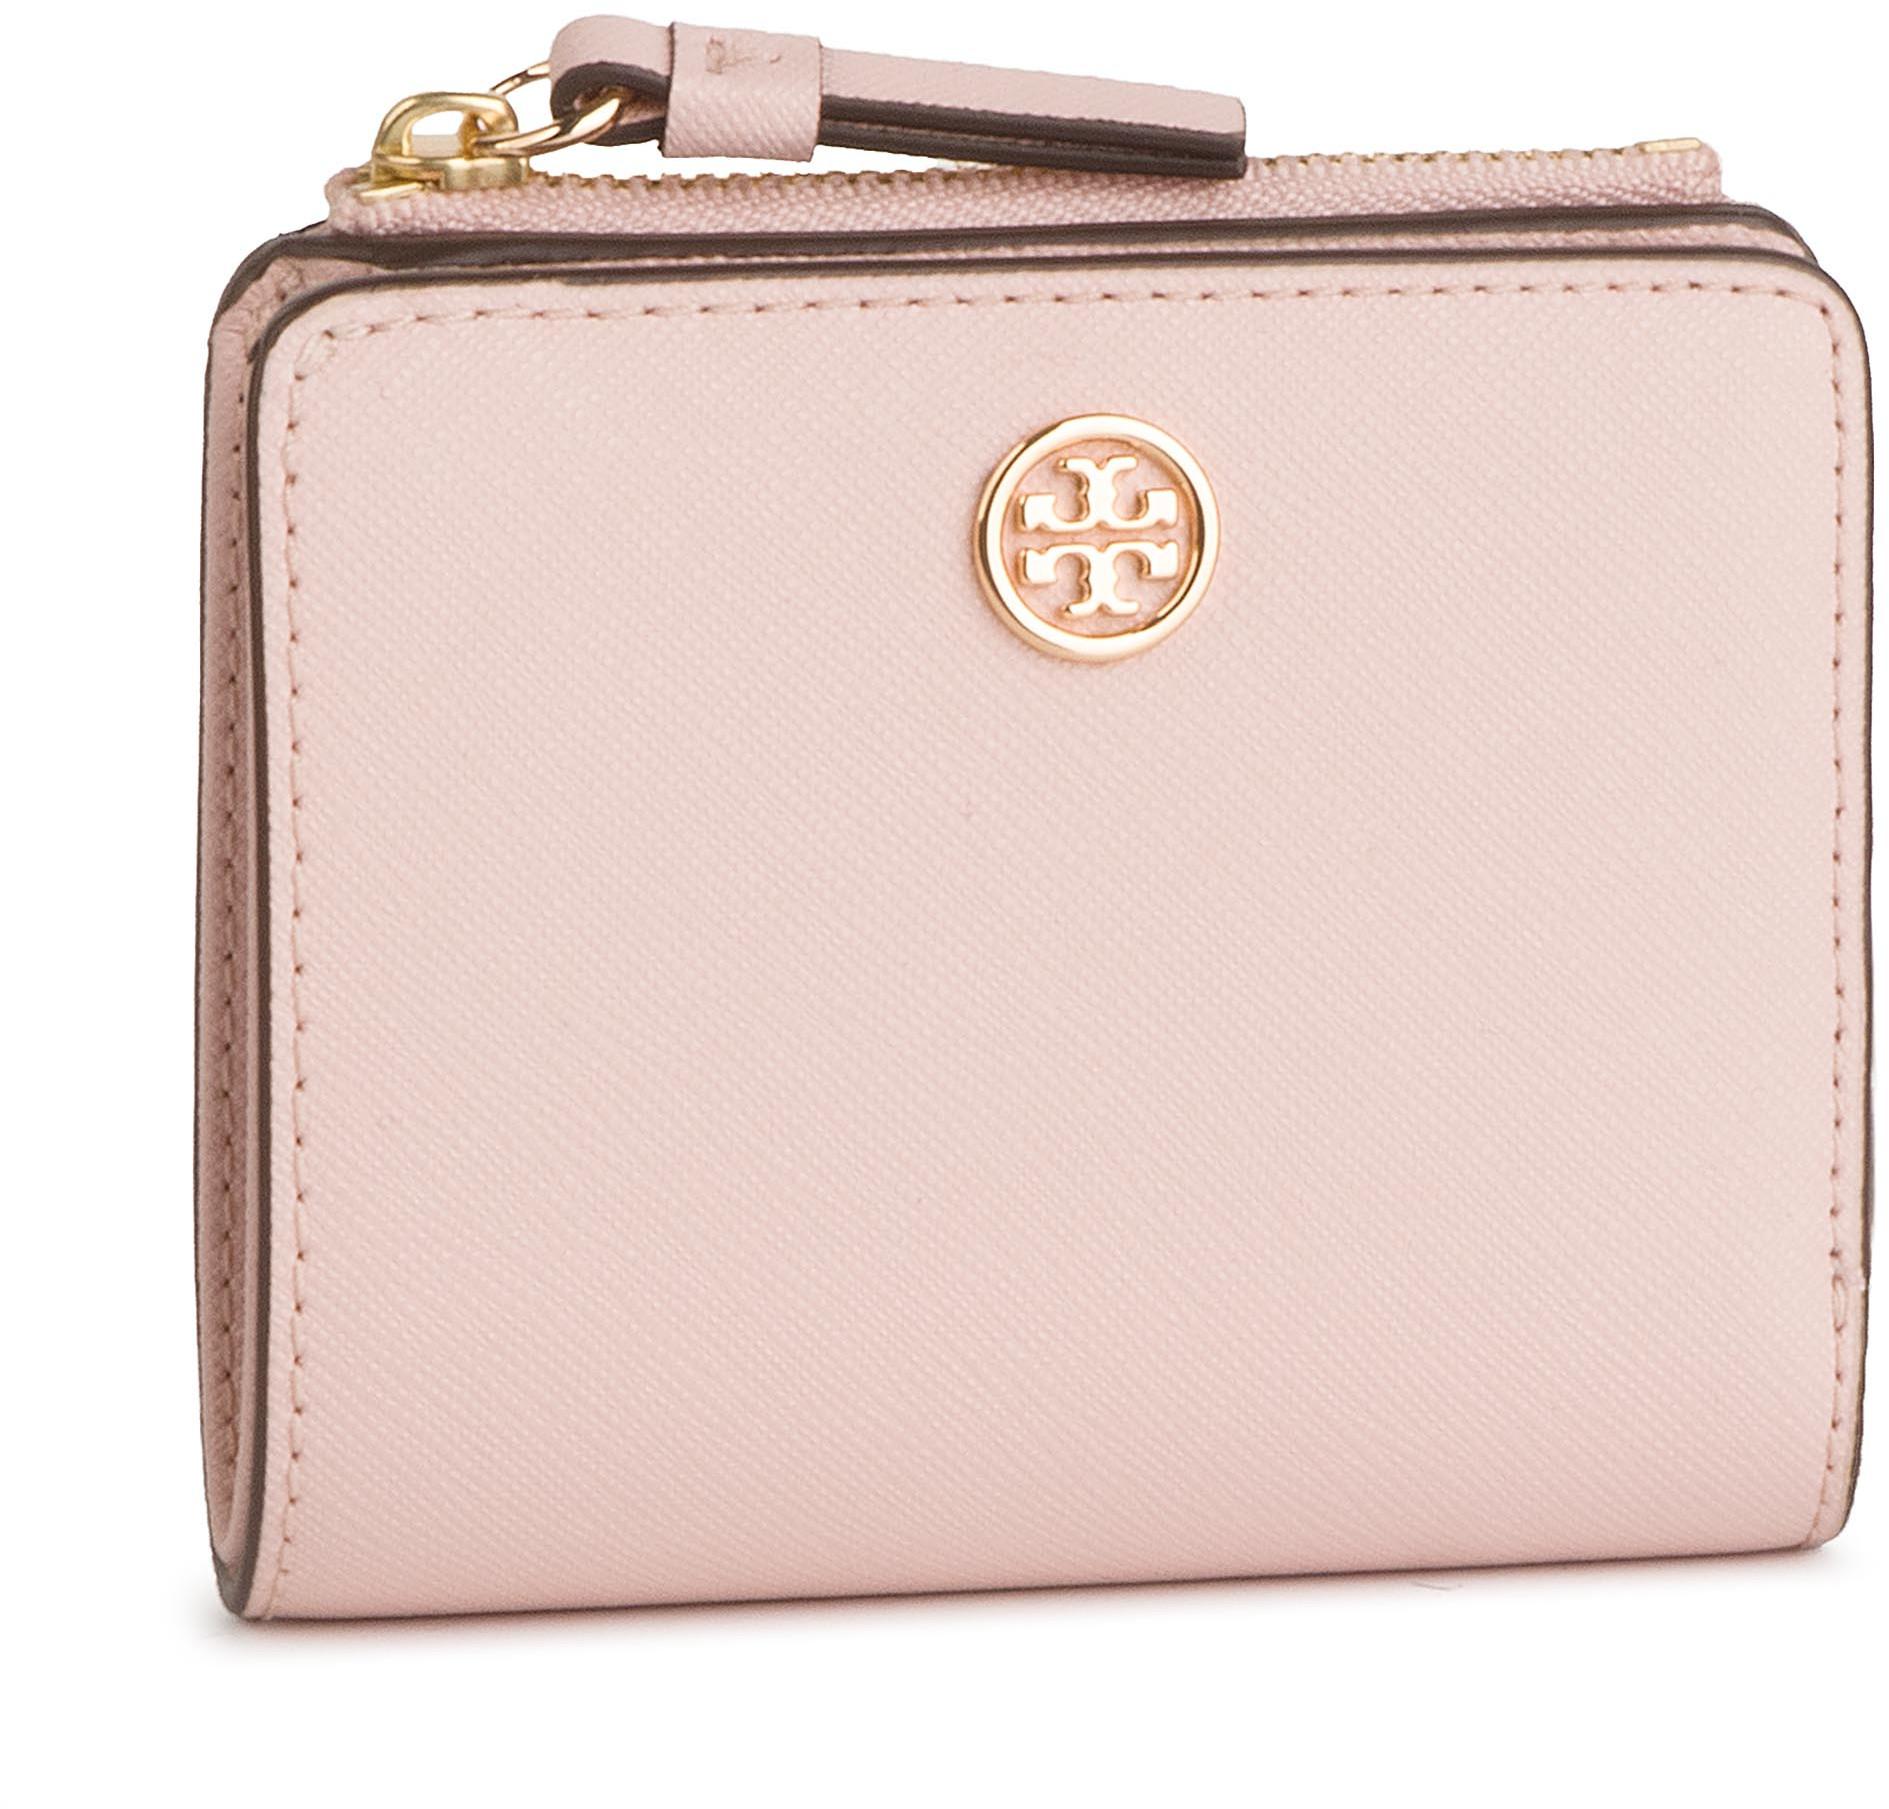 7d4c4858b0870 Tory Burch Mały Portfel Damski TORY BURCH - Robbinson Mini Wallet 54449  Shell Pink 652